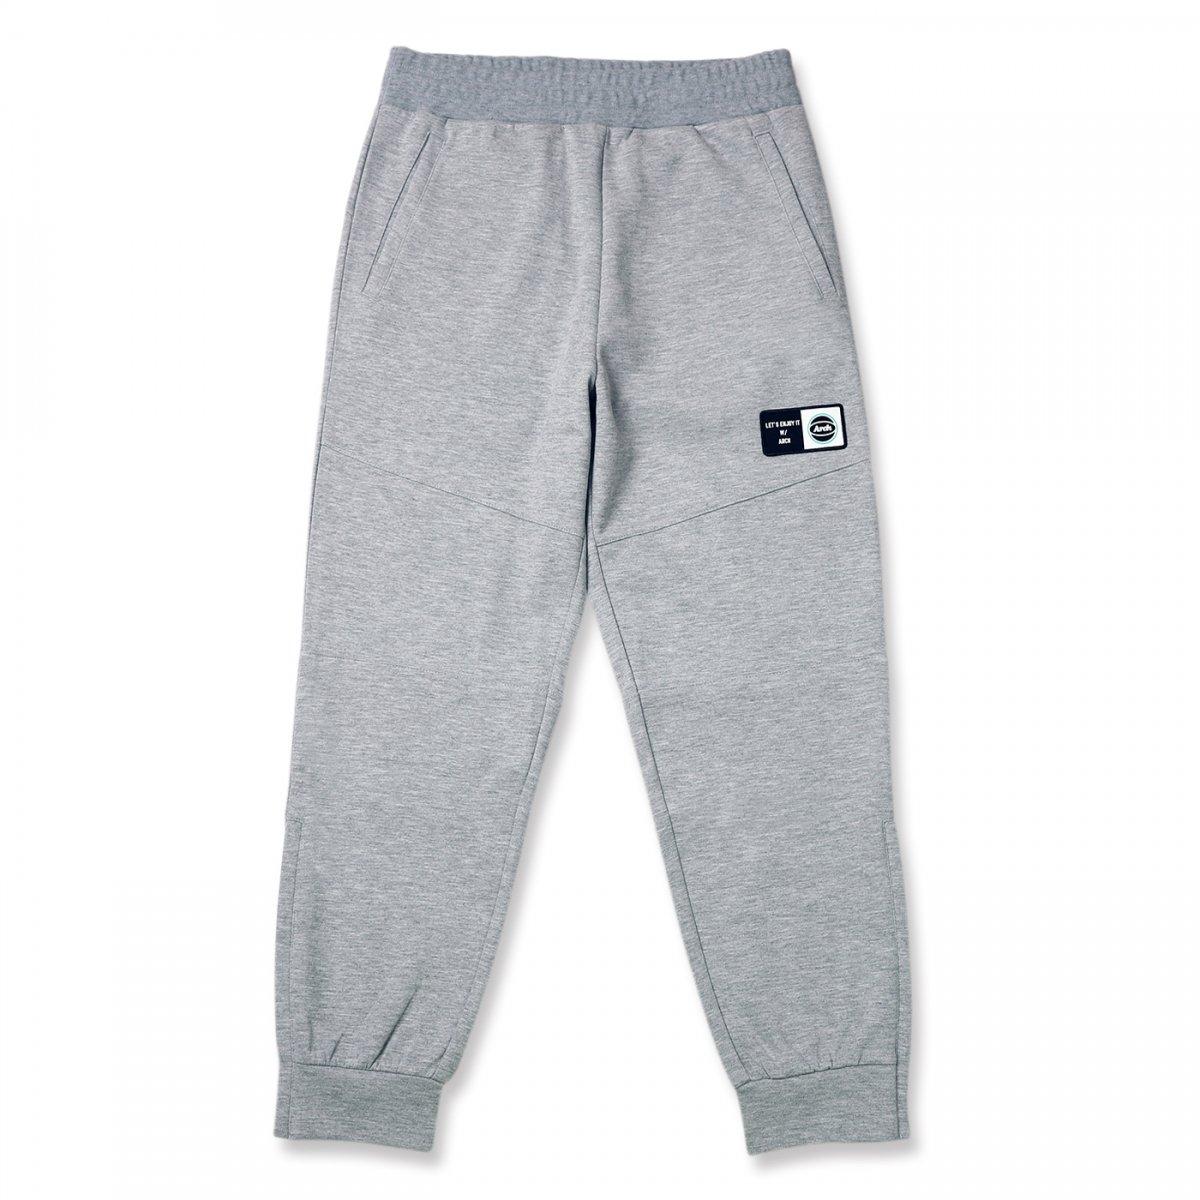 sport jogger pants【gray】